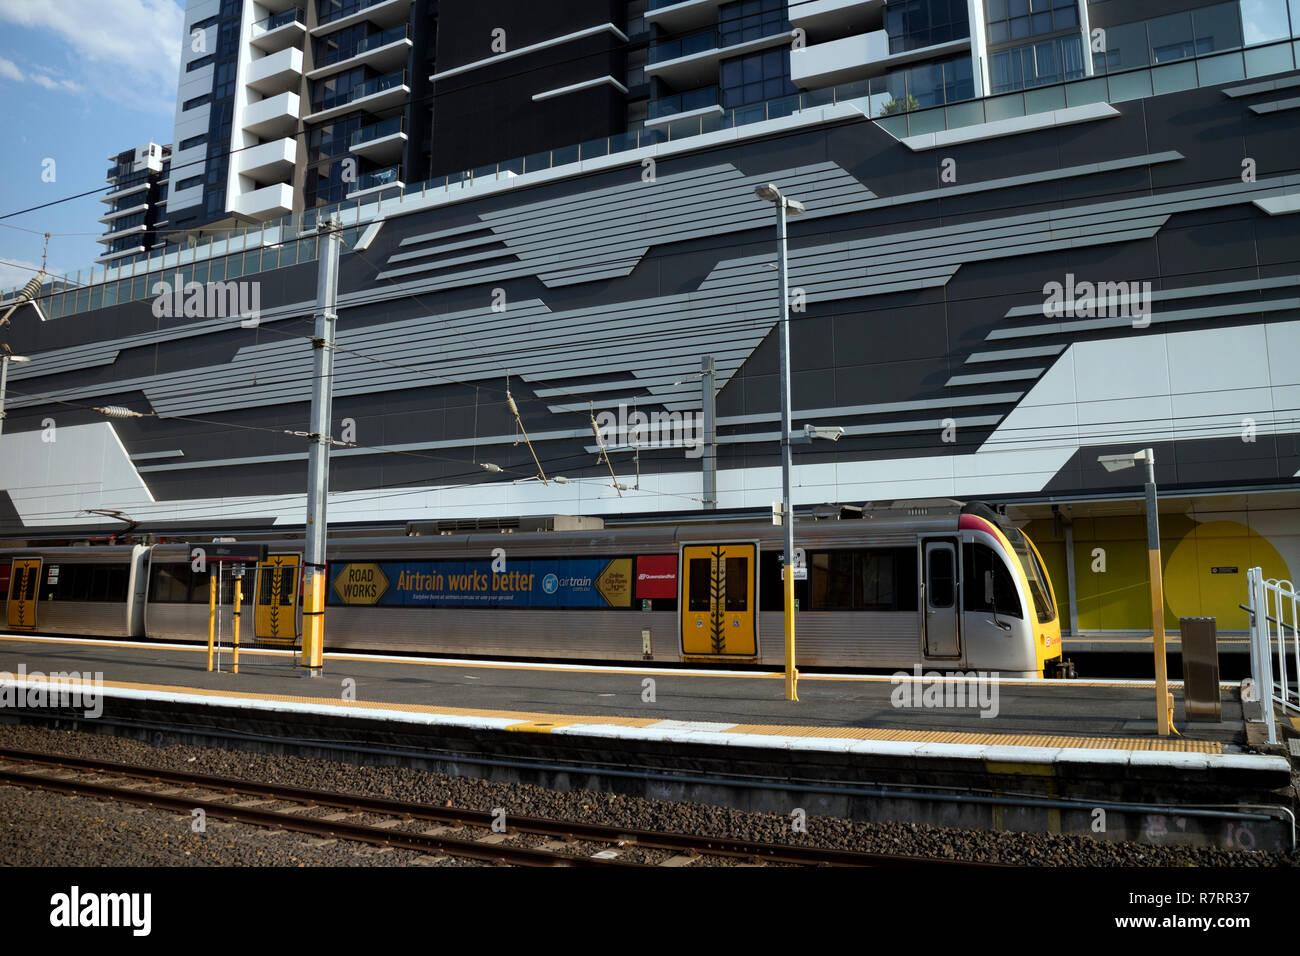 A Queensland Rail SMU train at Milton station, Brisbane, Queensland, Australia - Stock Image